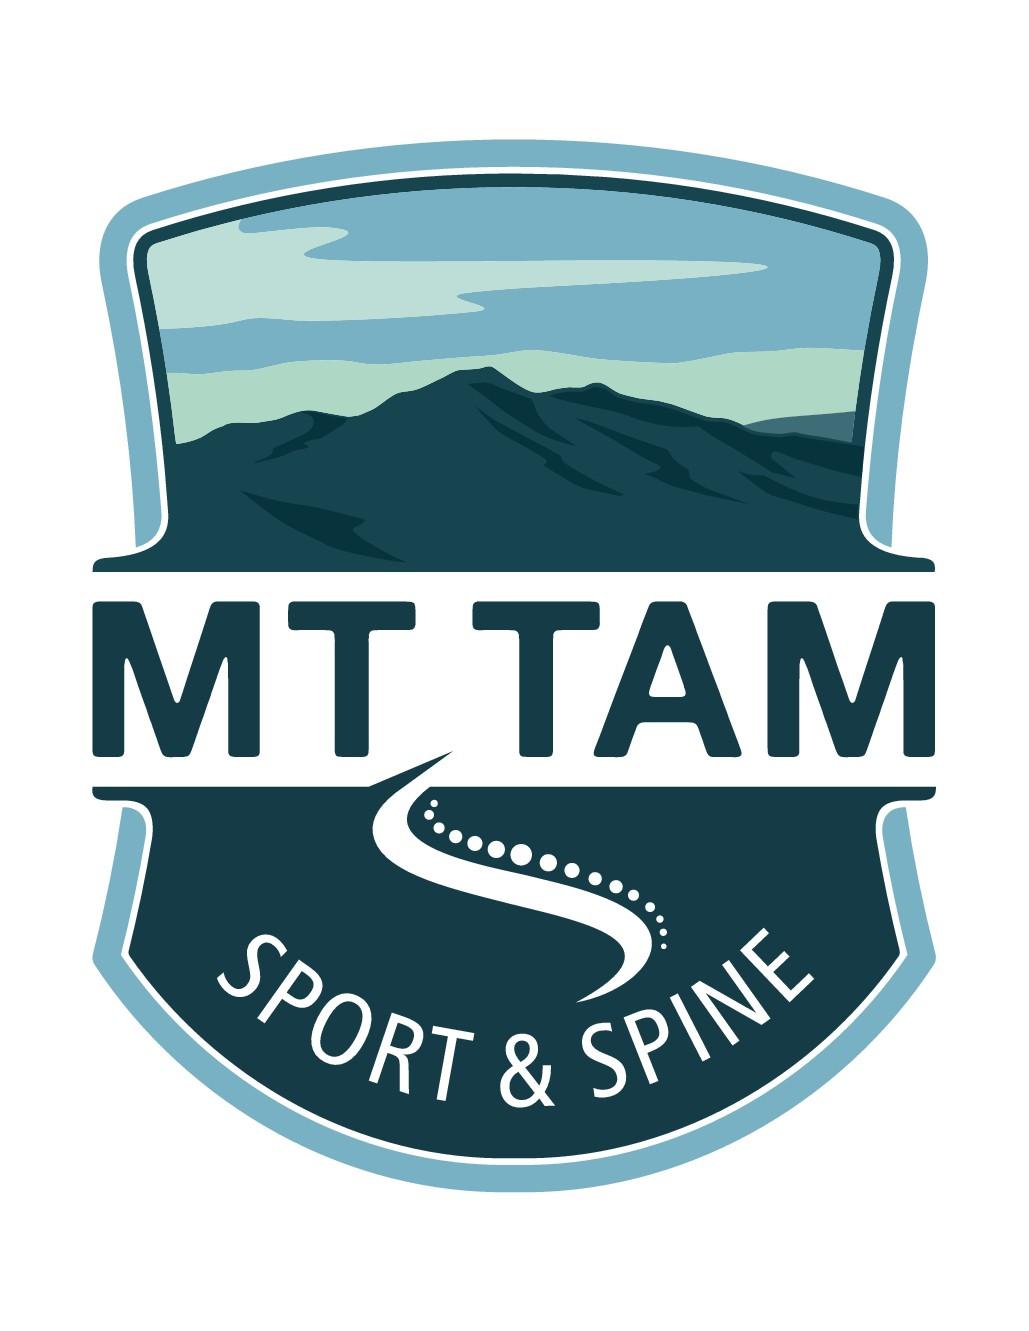 Design a simple yet artistic sports medicine logo for Mt Tam Sport & Spine